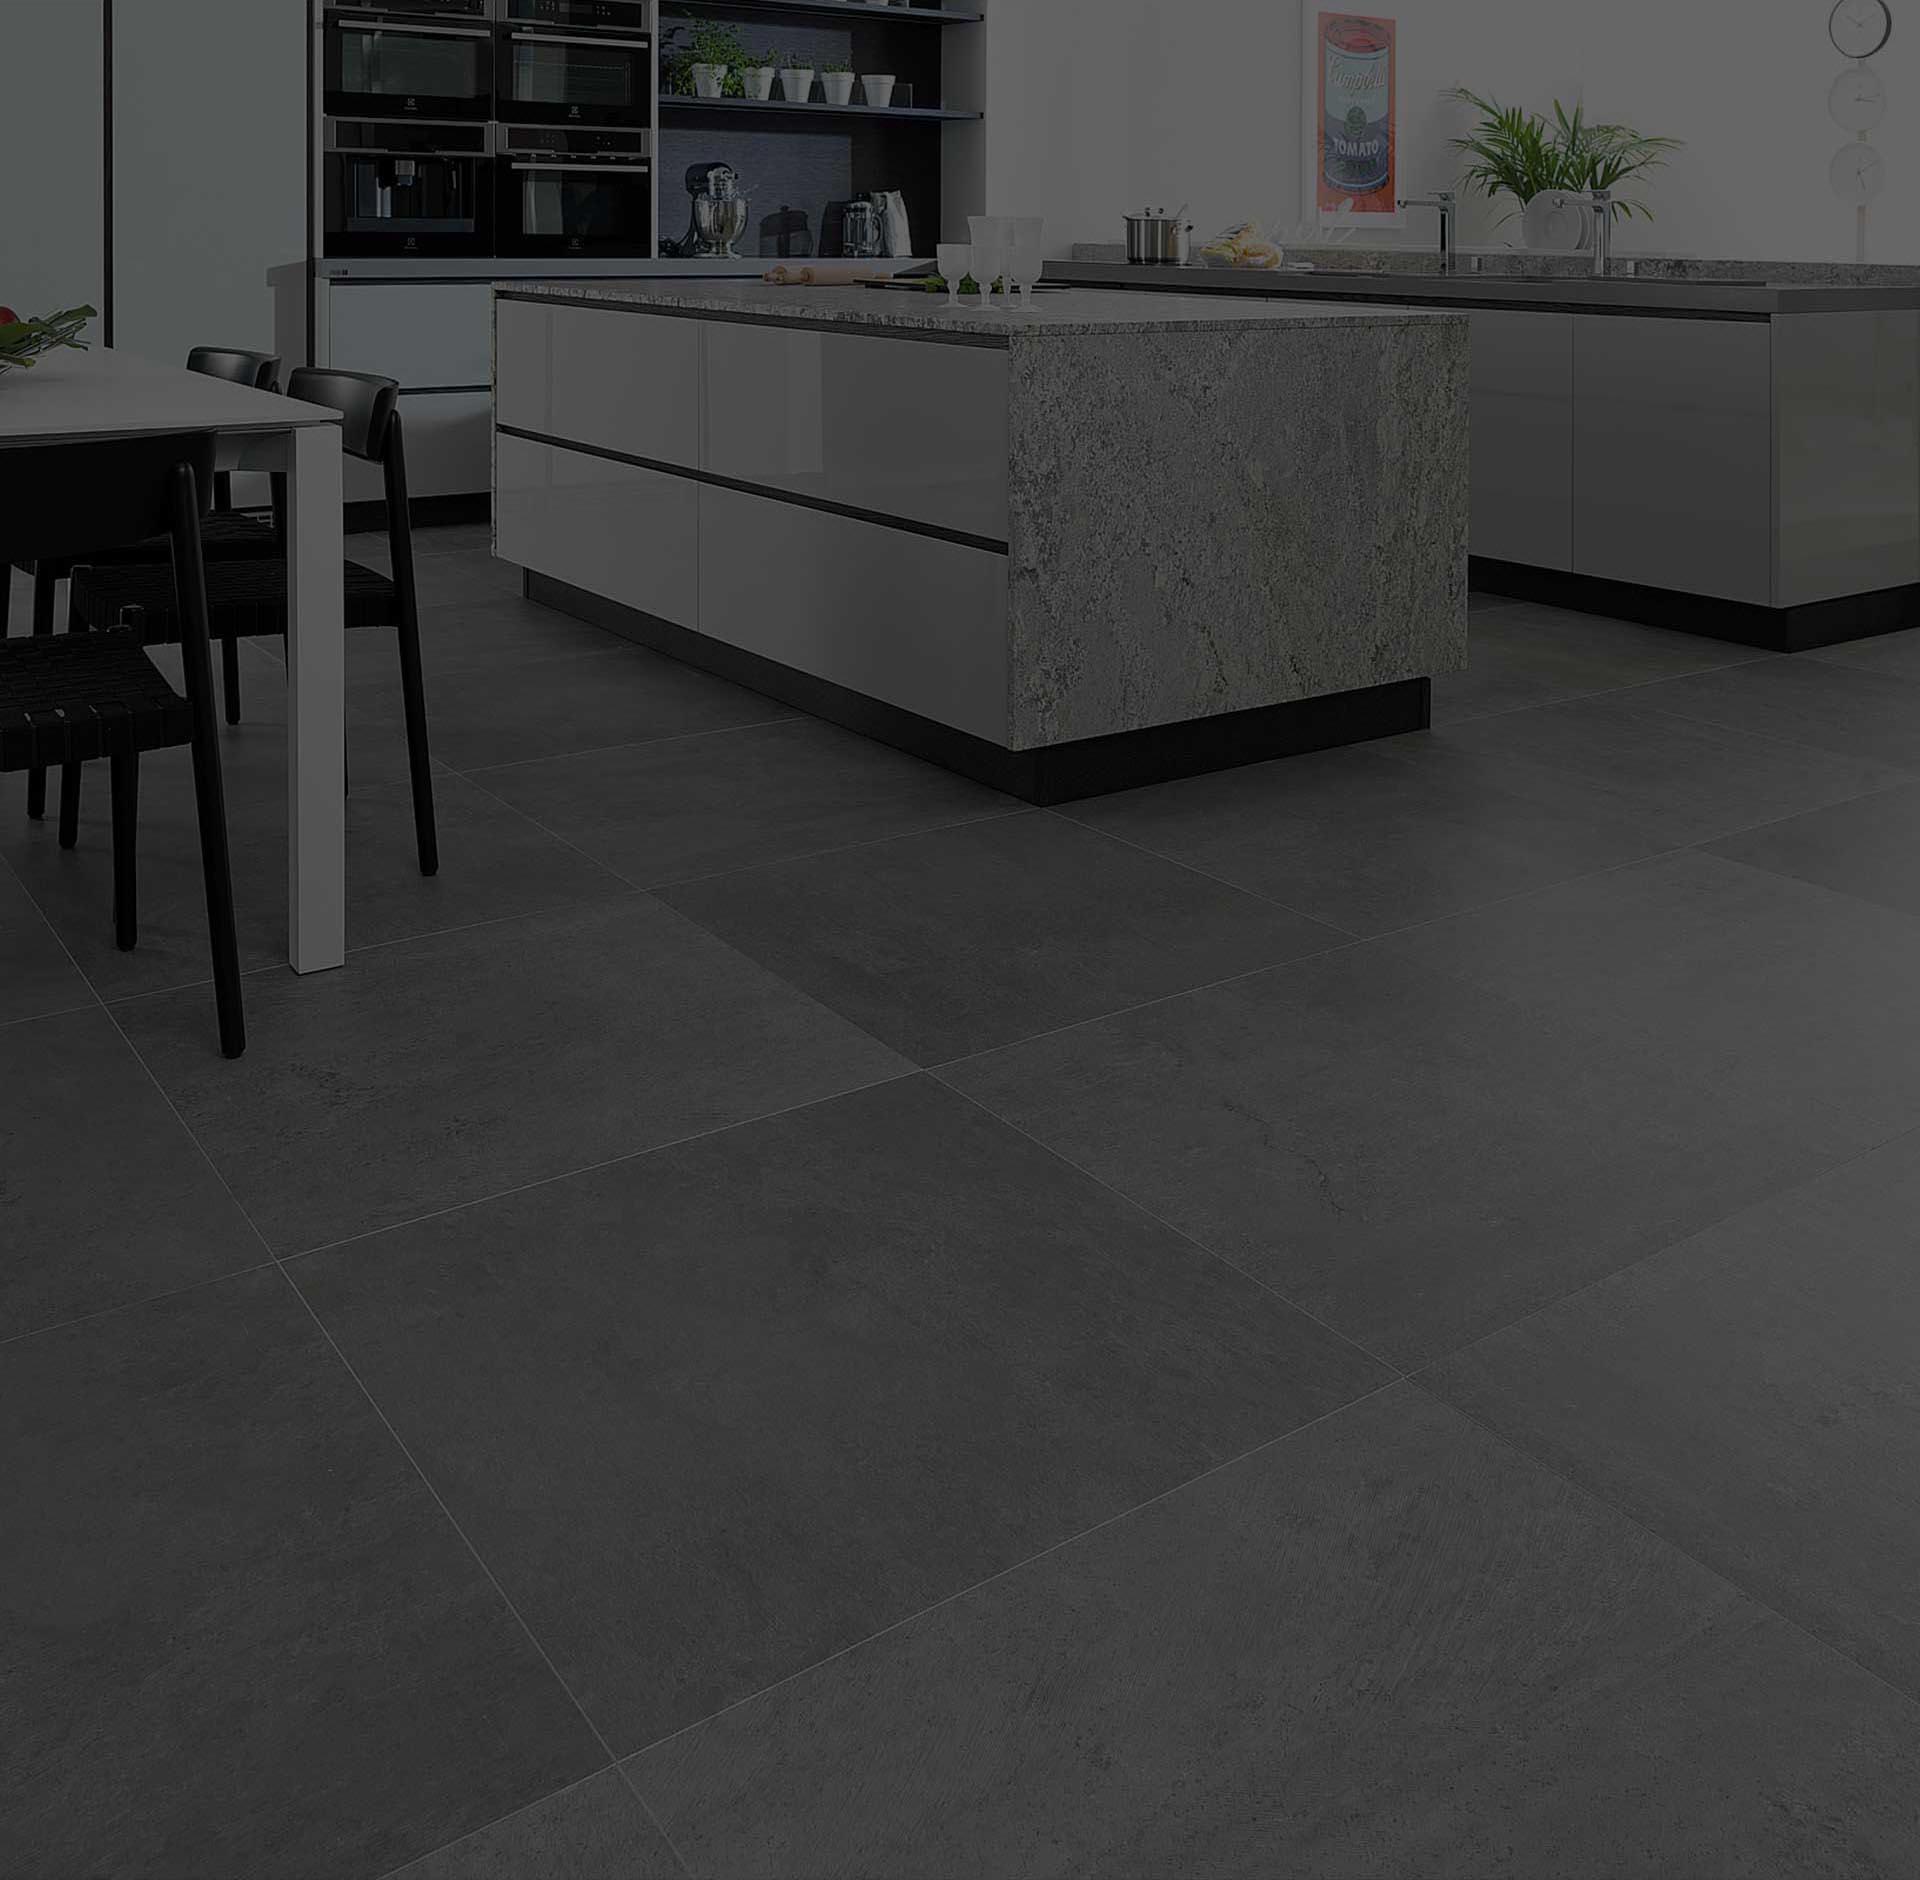 Ceramo Concrete Look Tiles Perth